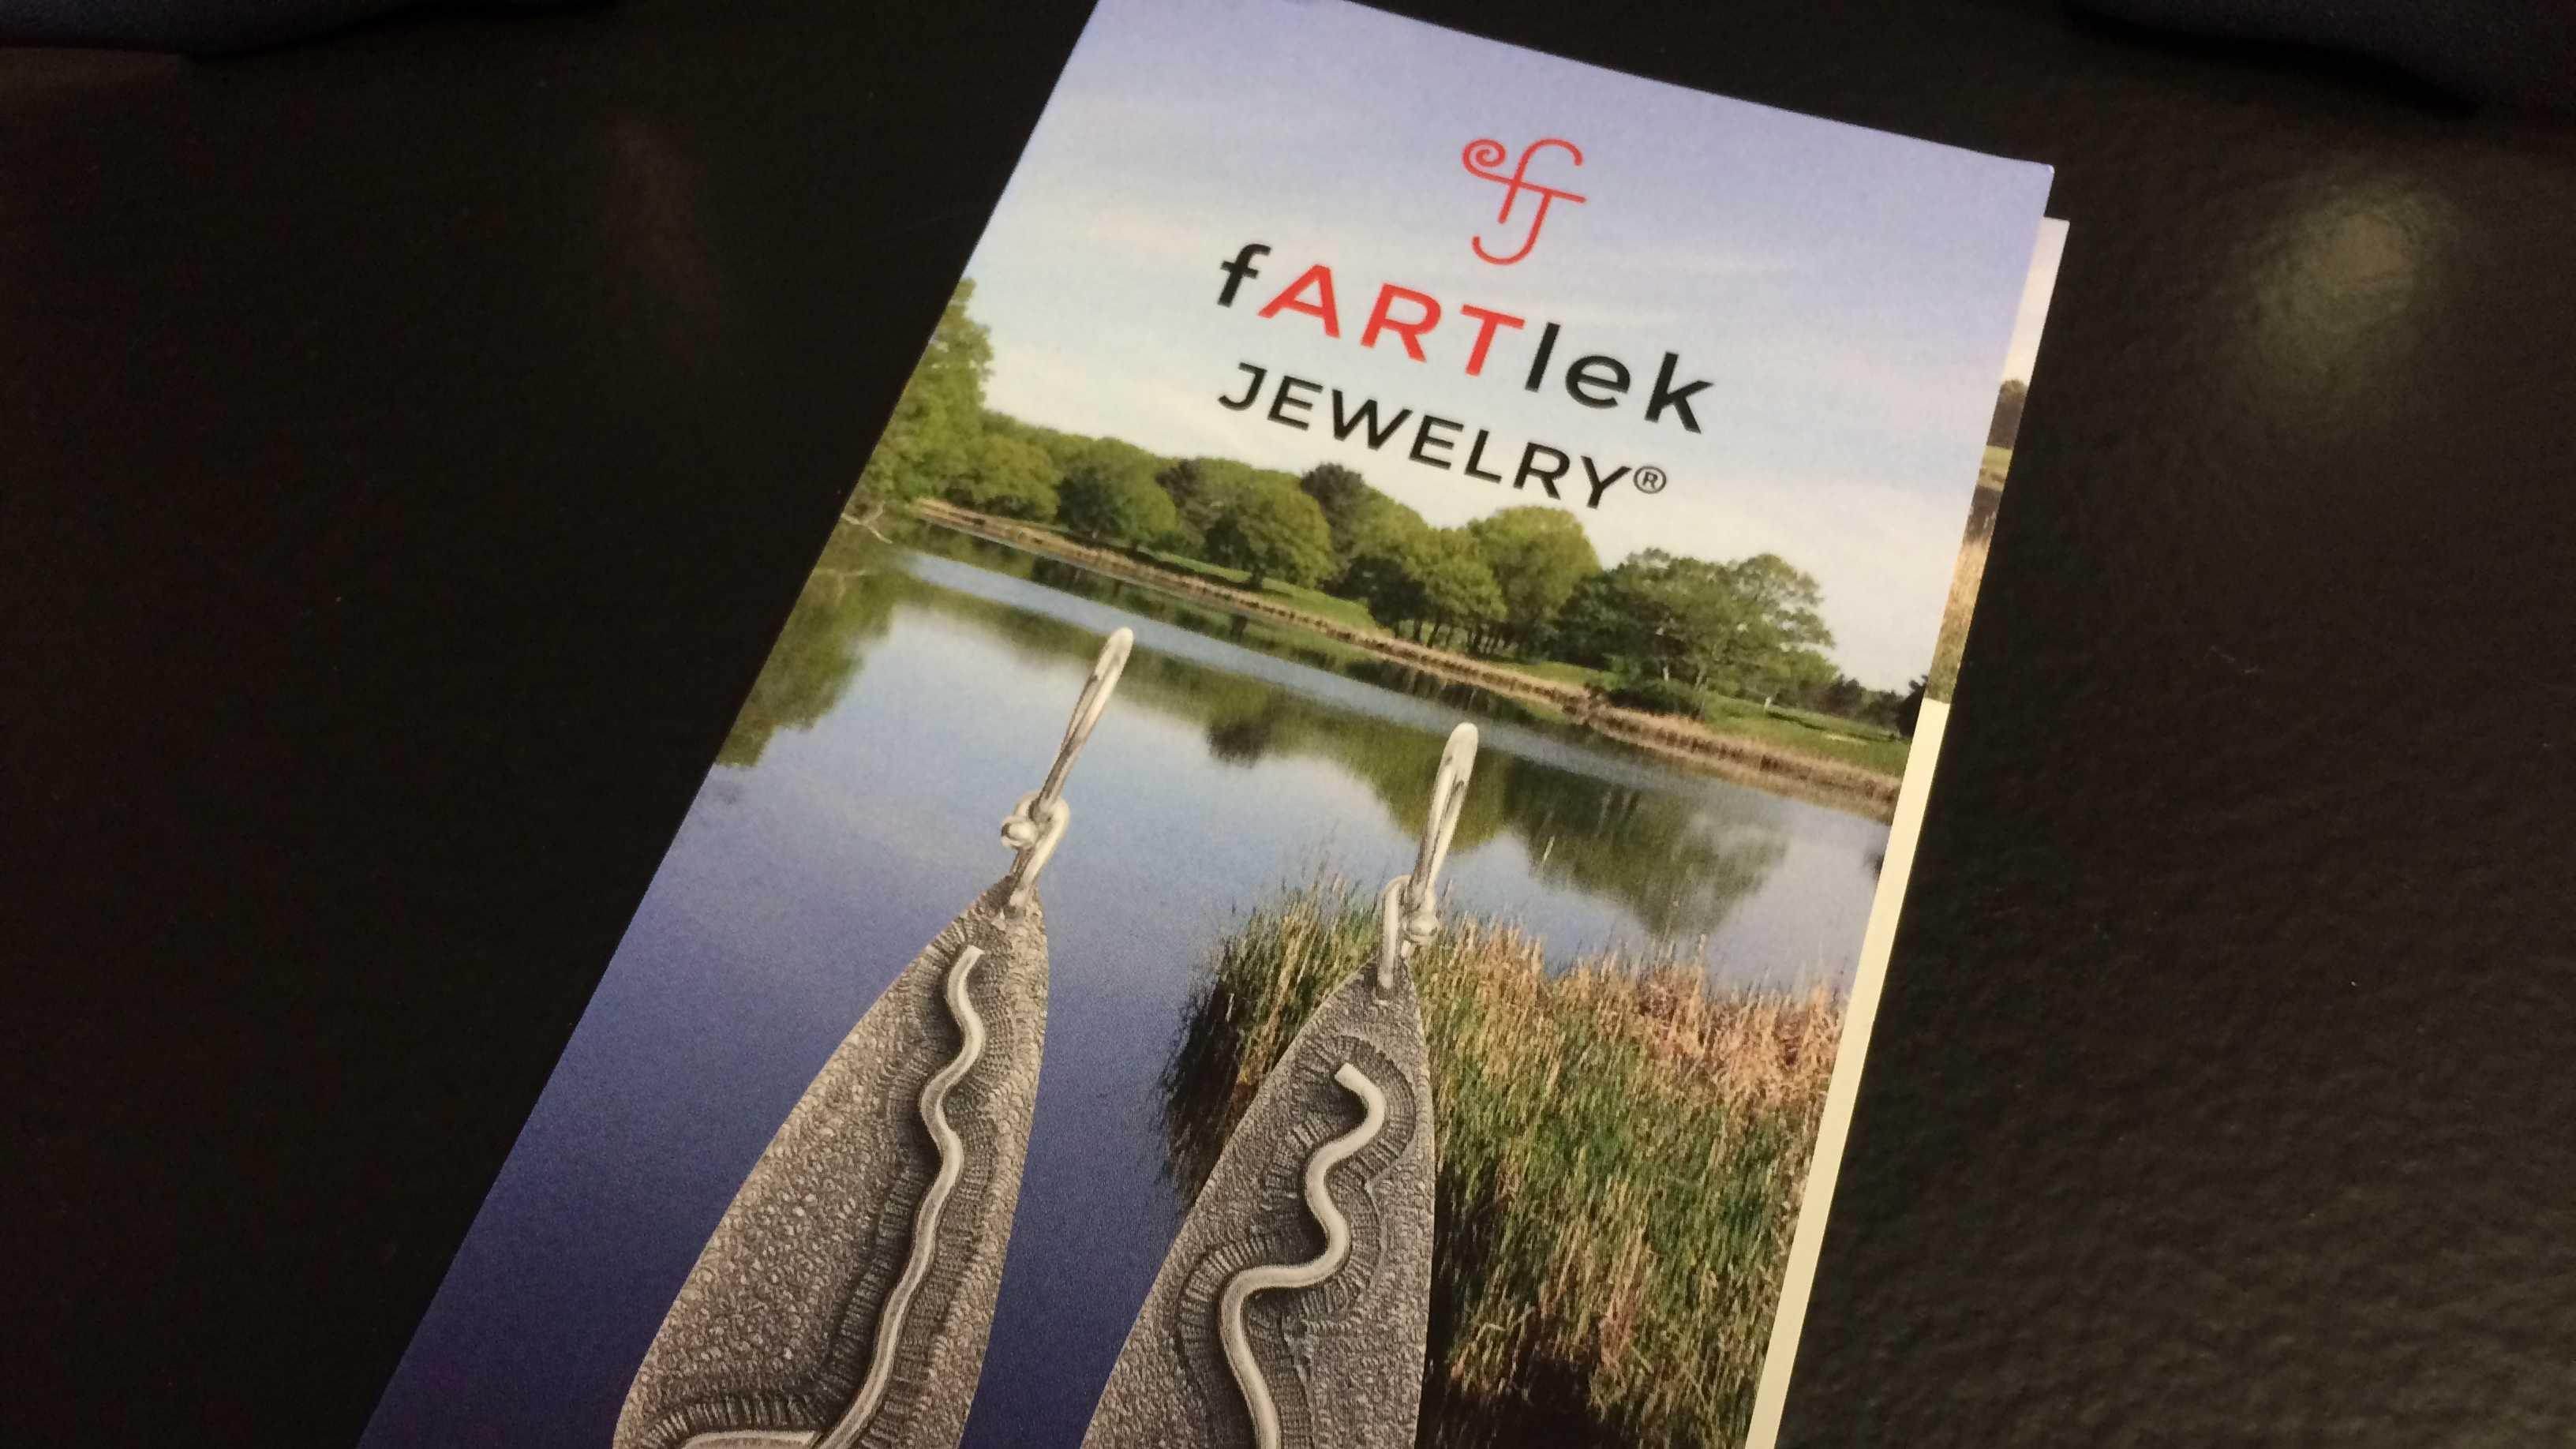 fArtlek Jewelry